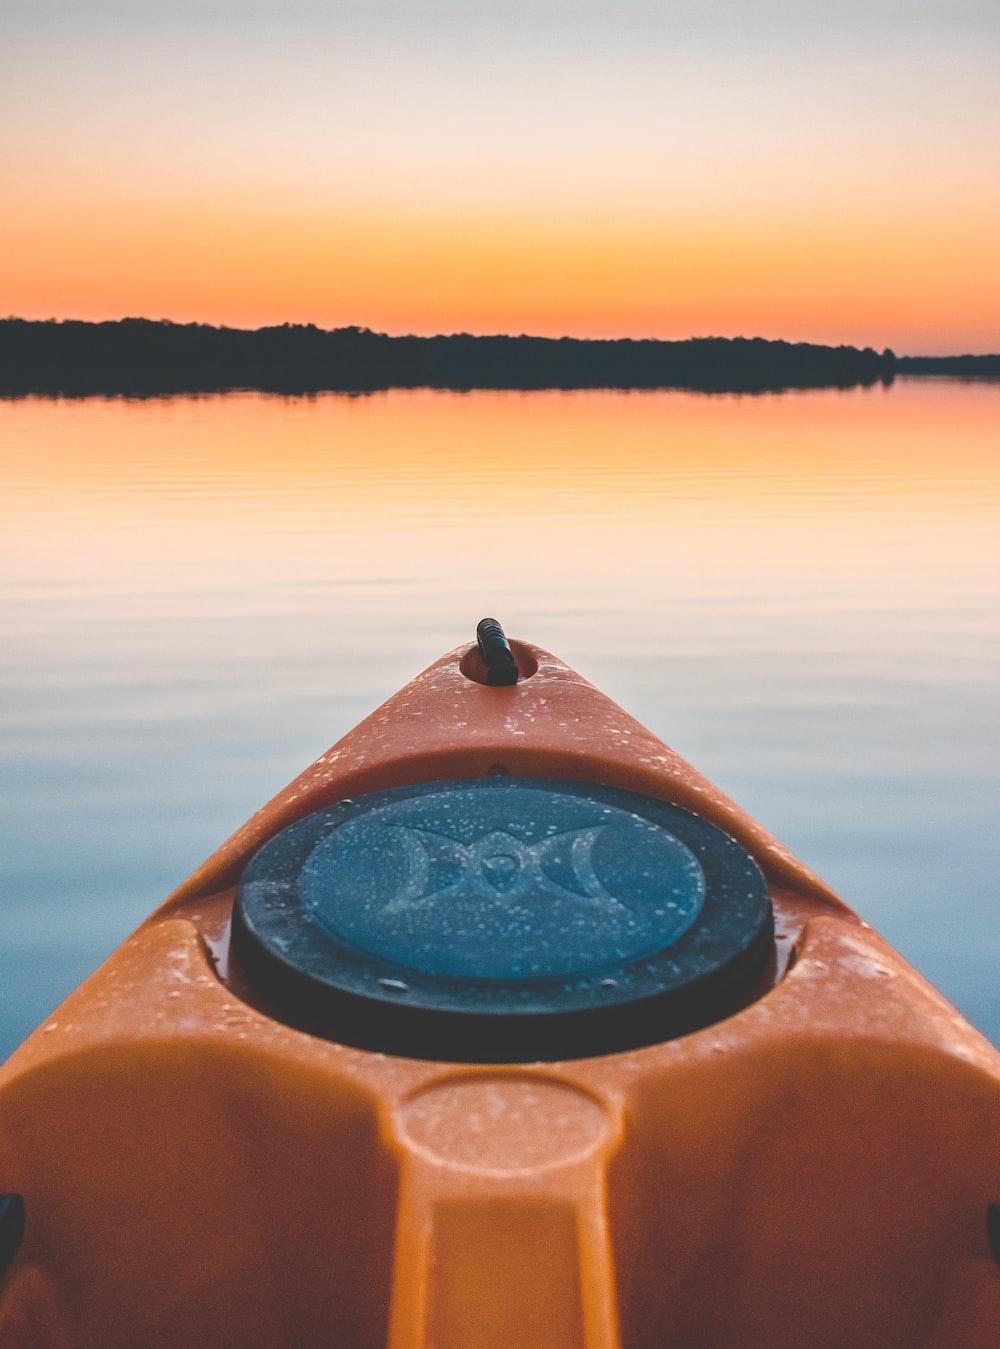 selective focus photography of orange kayak